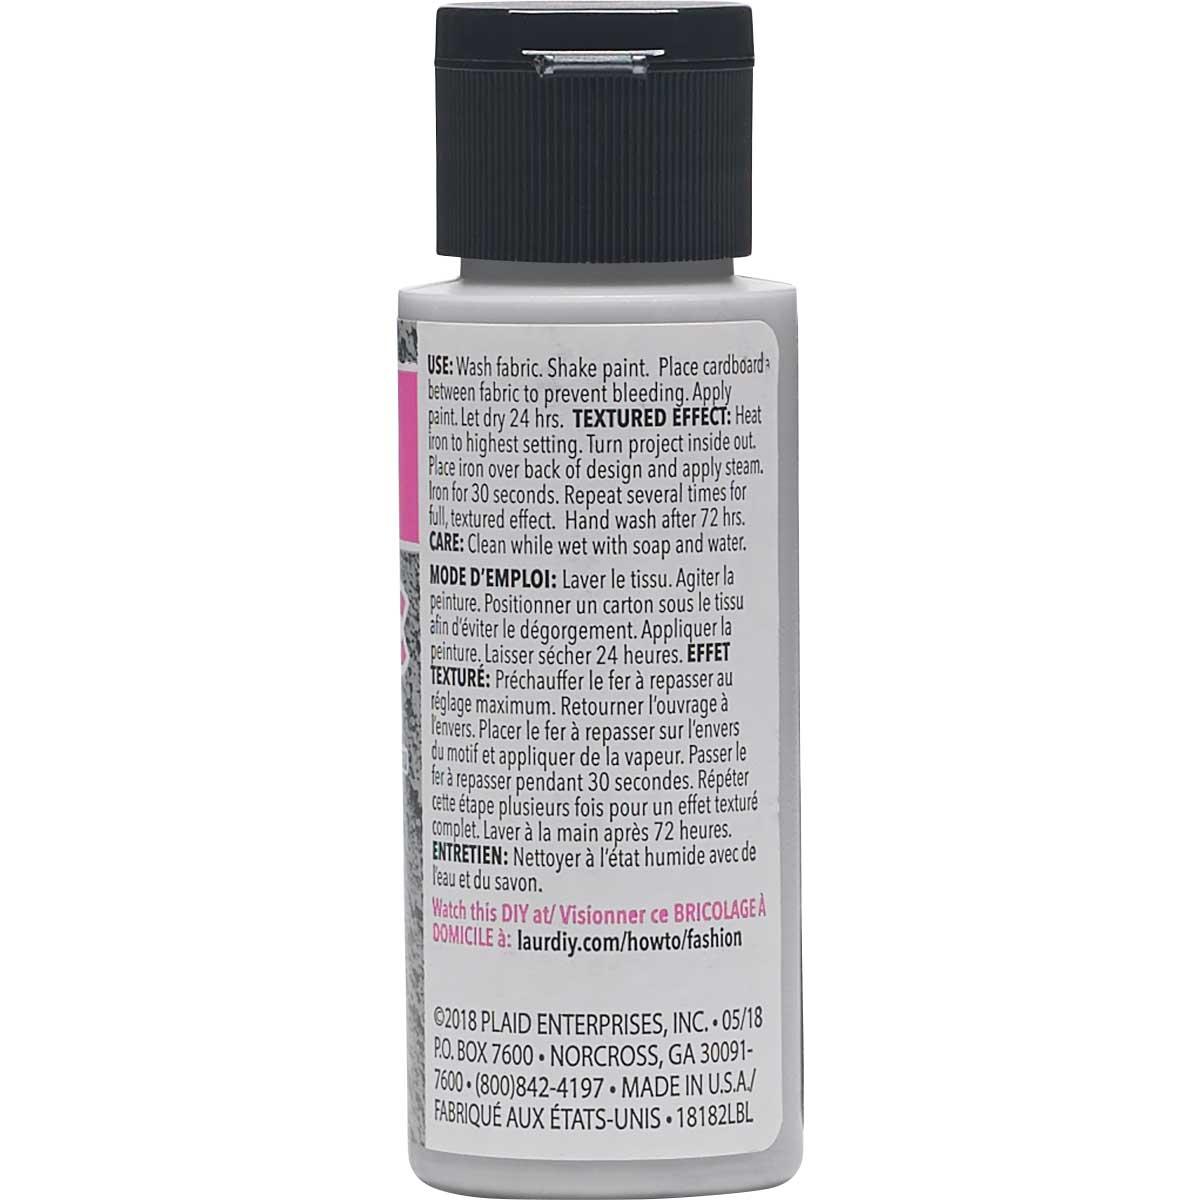 LaurDIY ® Texturific™ Fabric Paint - Lovely Bones, 2 oz.